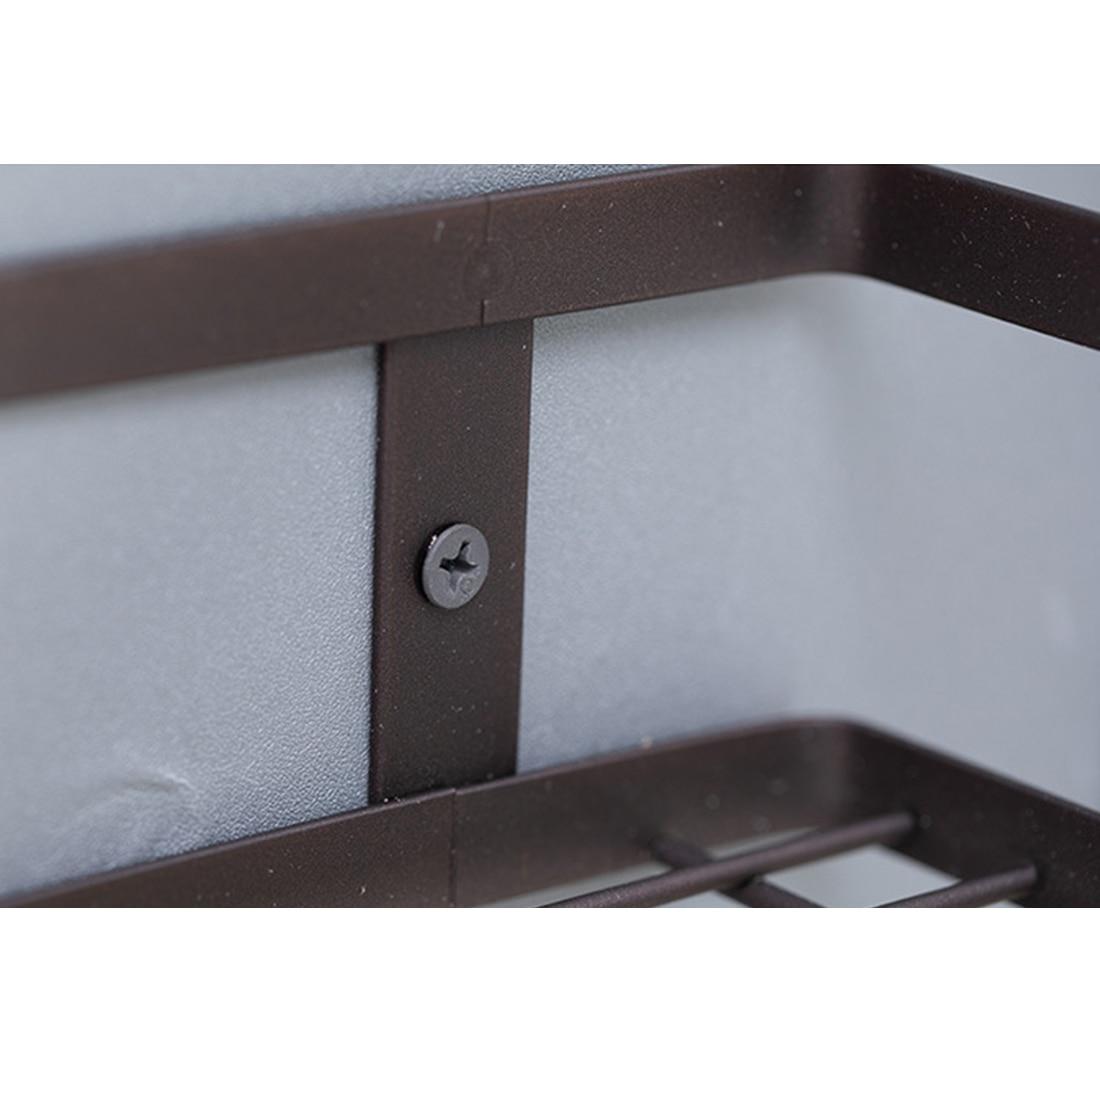 New Nordic Iron Art Storage Rack Wall Hanger Organizer Holder Rack Container Stand for Kitchen Bathroom Livingroom Bedroom Decor in Storage Holders Racks from Home Garden